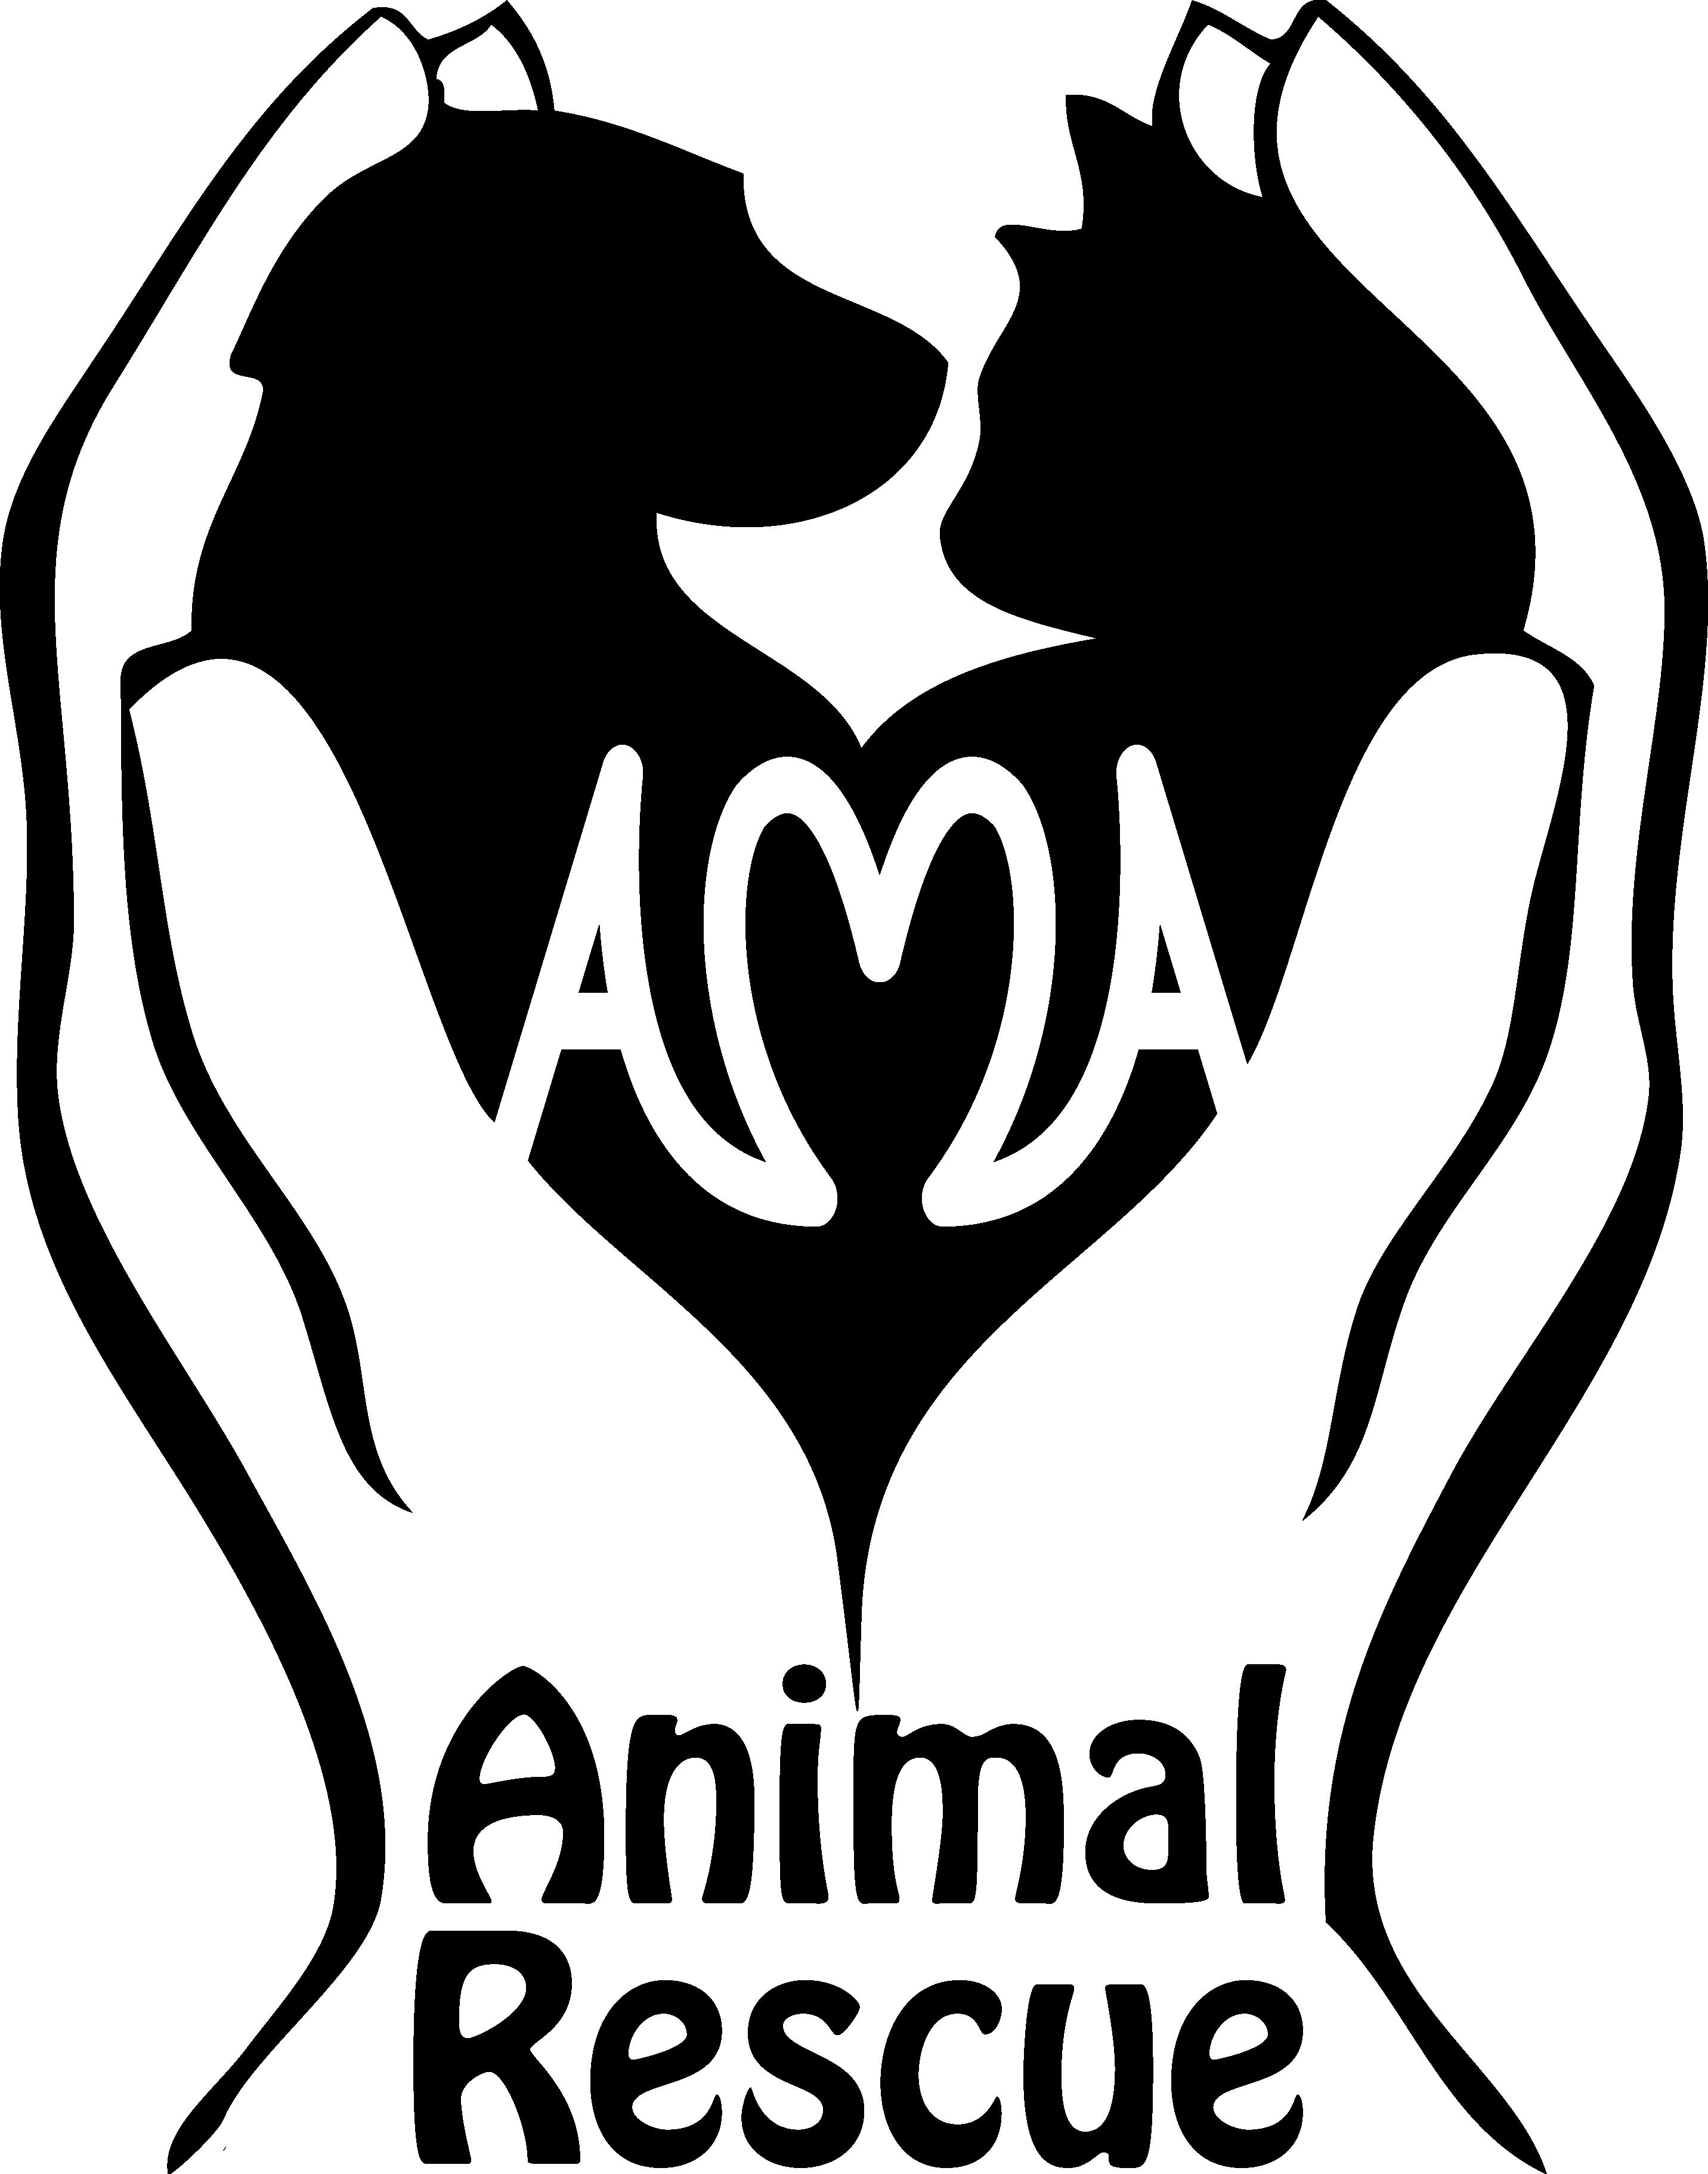 Logo of charity AMA Animal Rescue